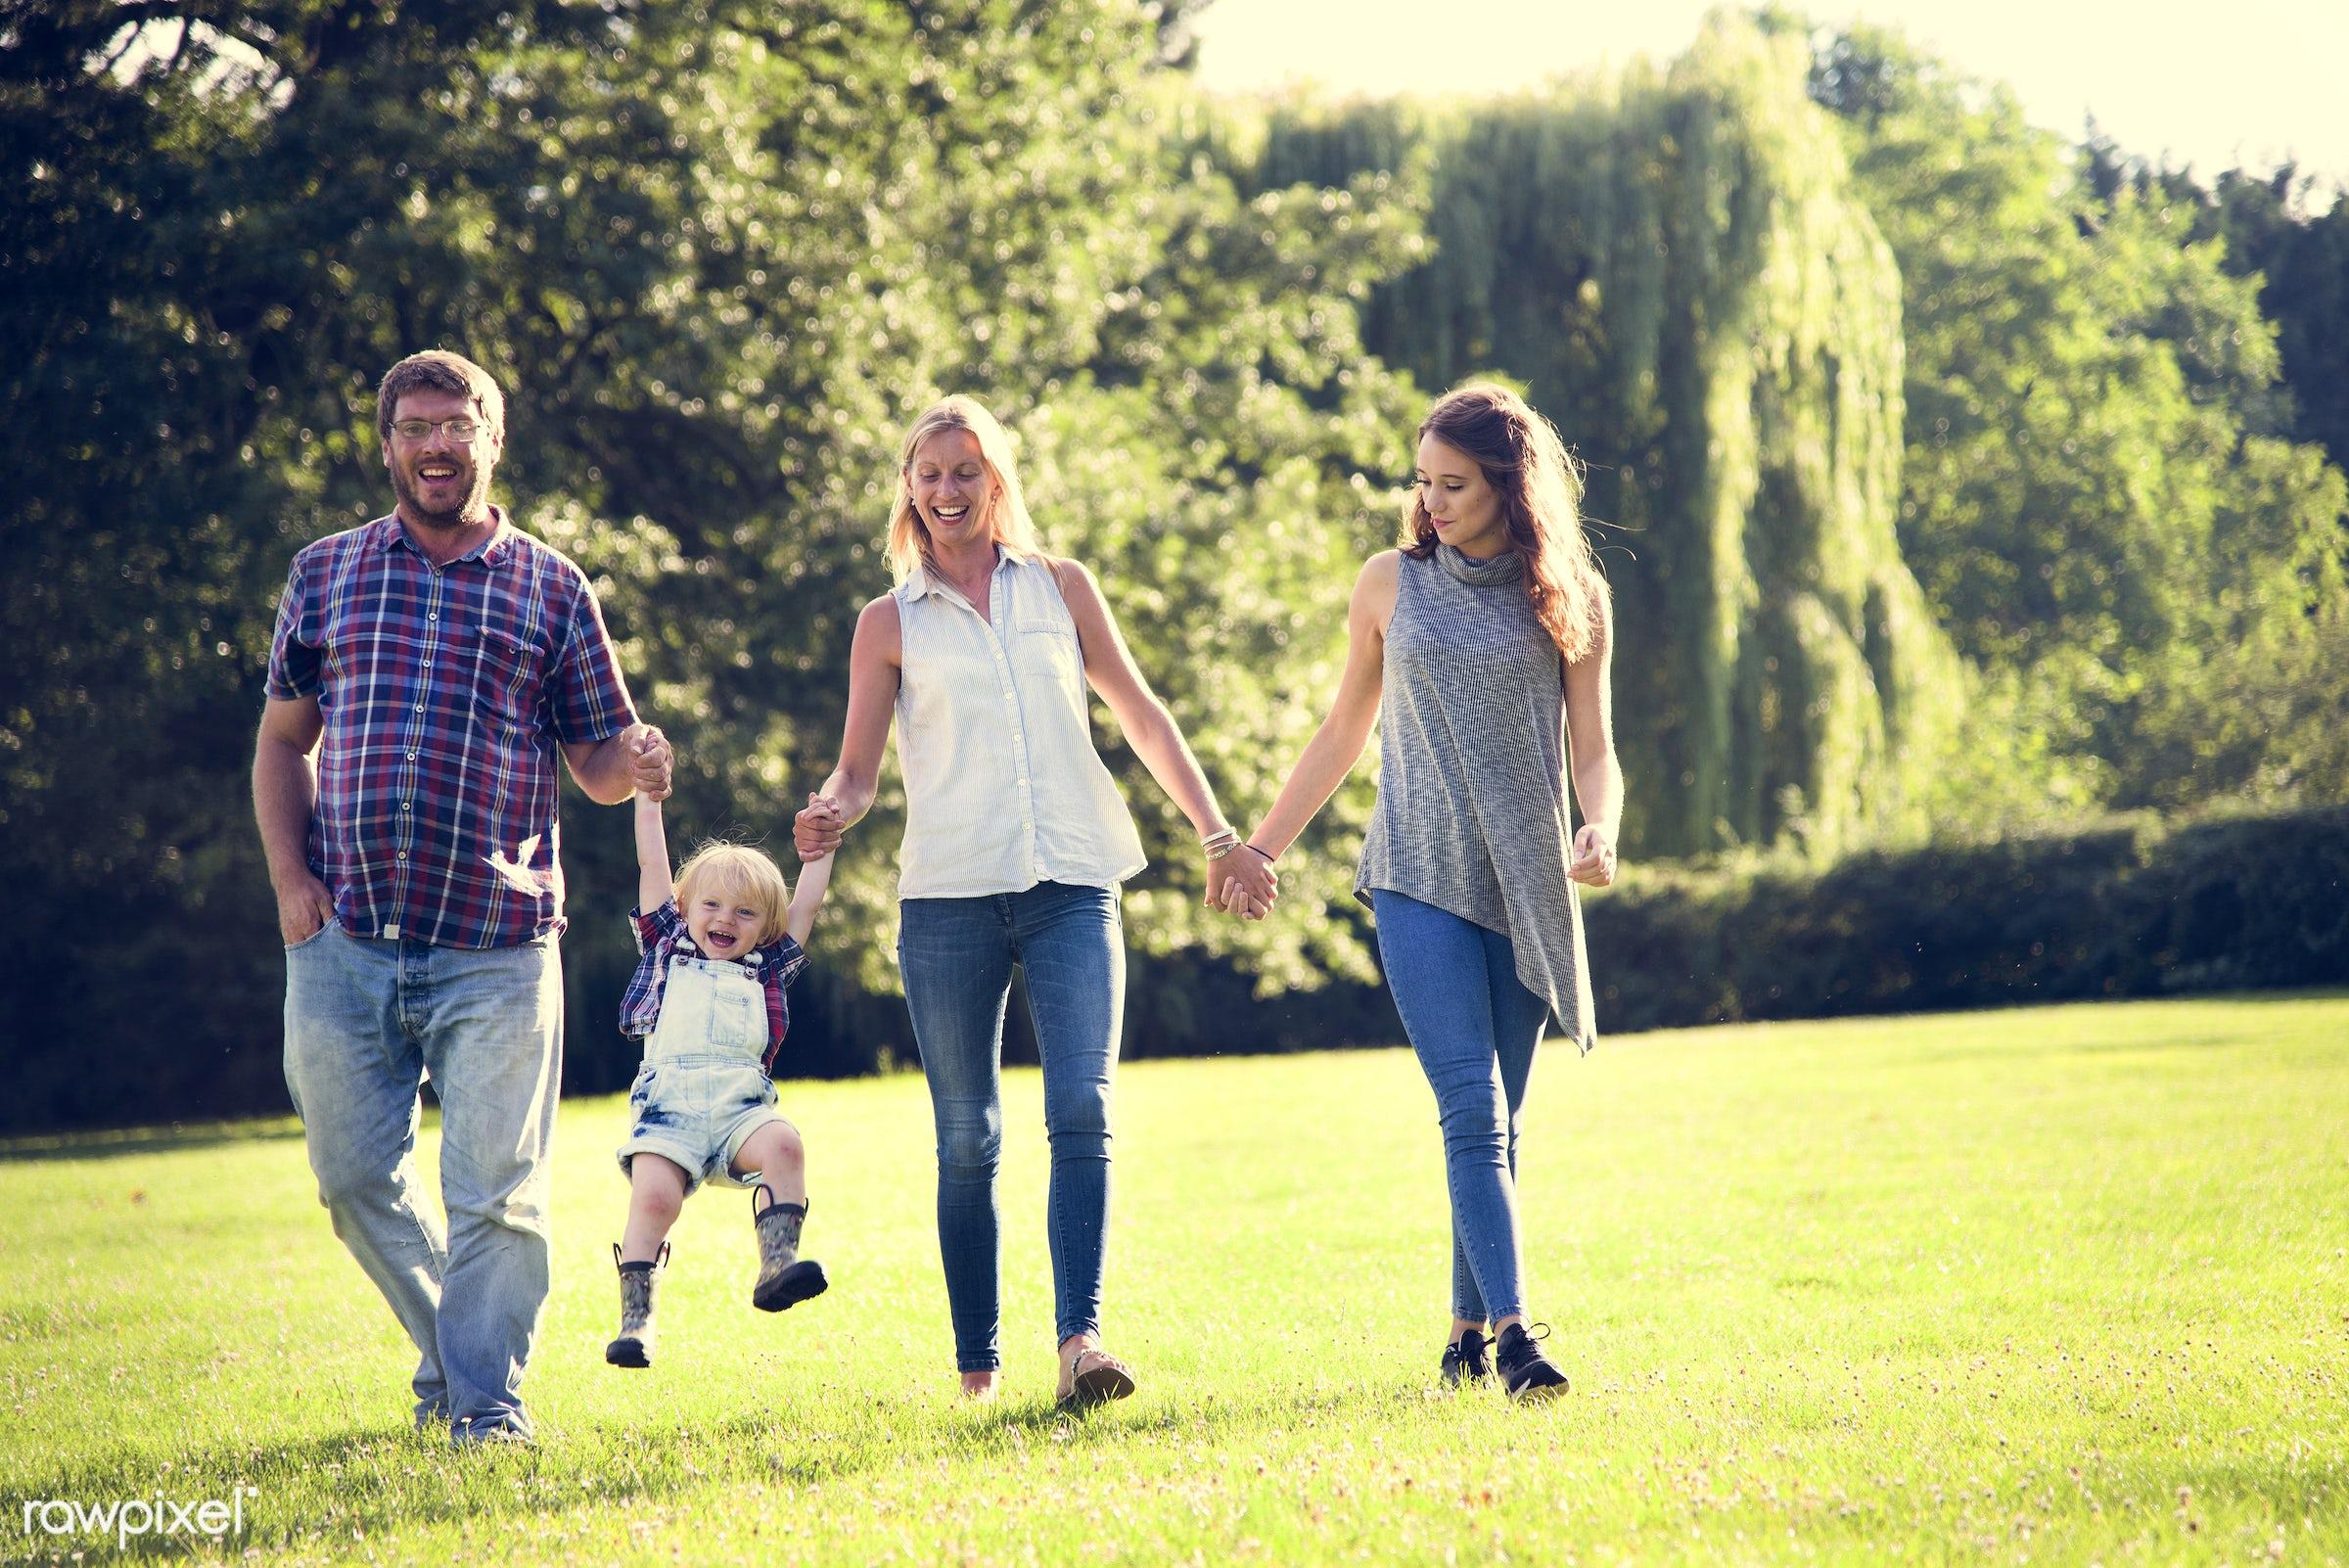 bonding, boy, care, casual, cheerful, childhood, children, enjoyment, environment, environmental, family, father, field,...